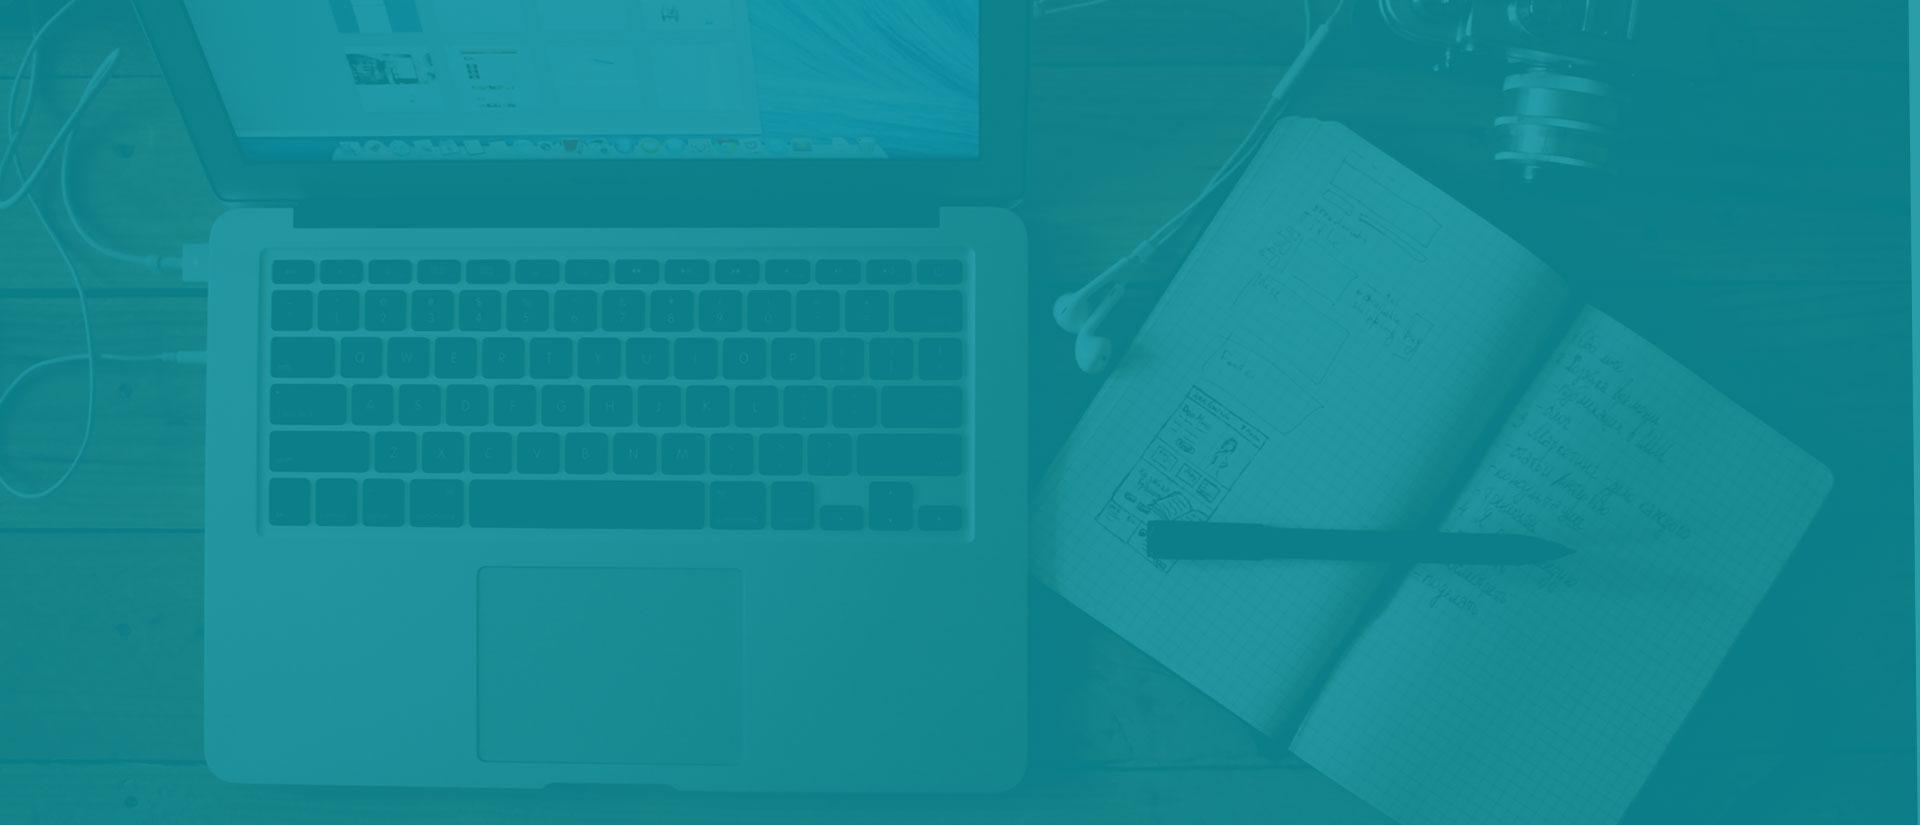 Ultimus Business Process Management Blog